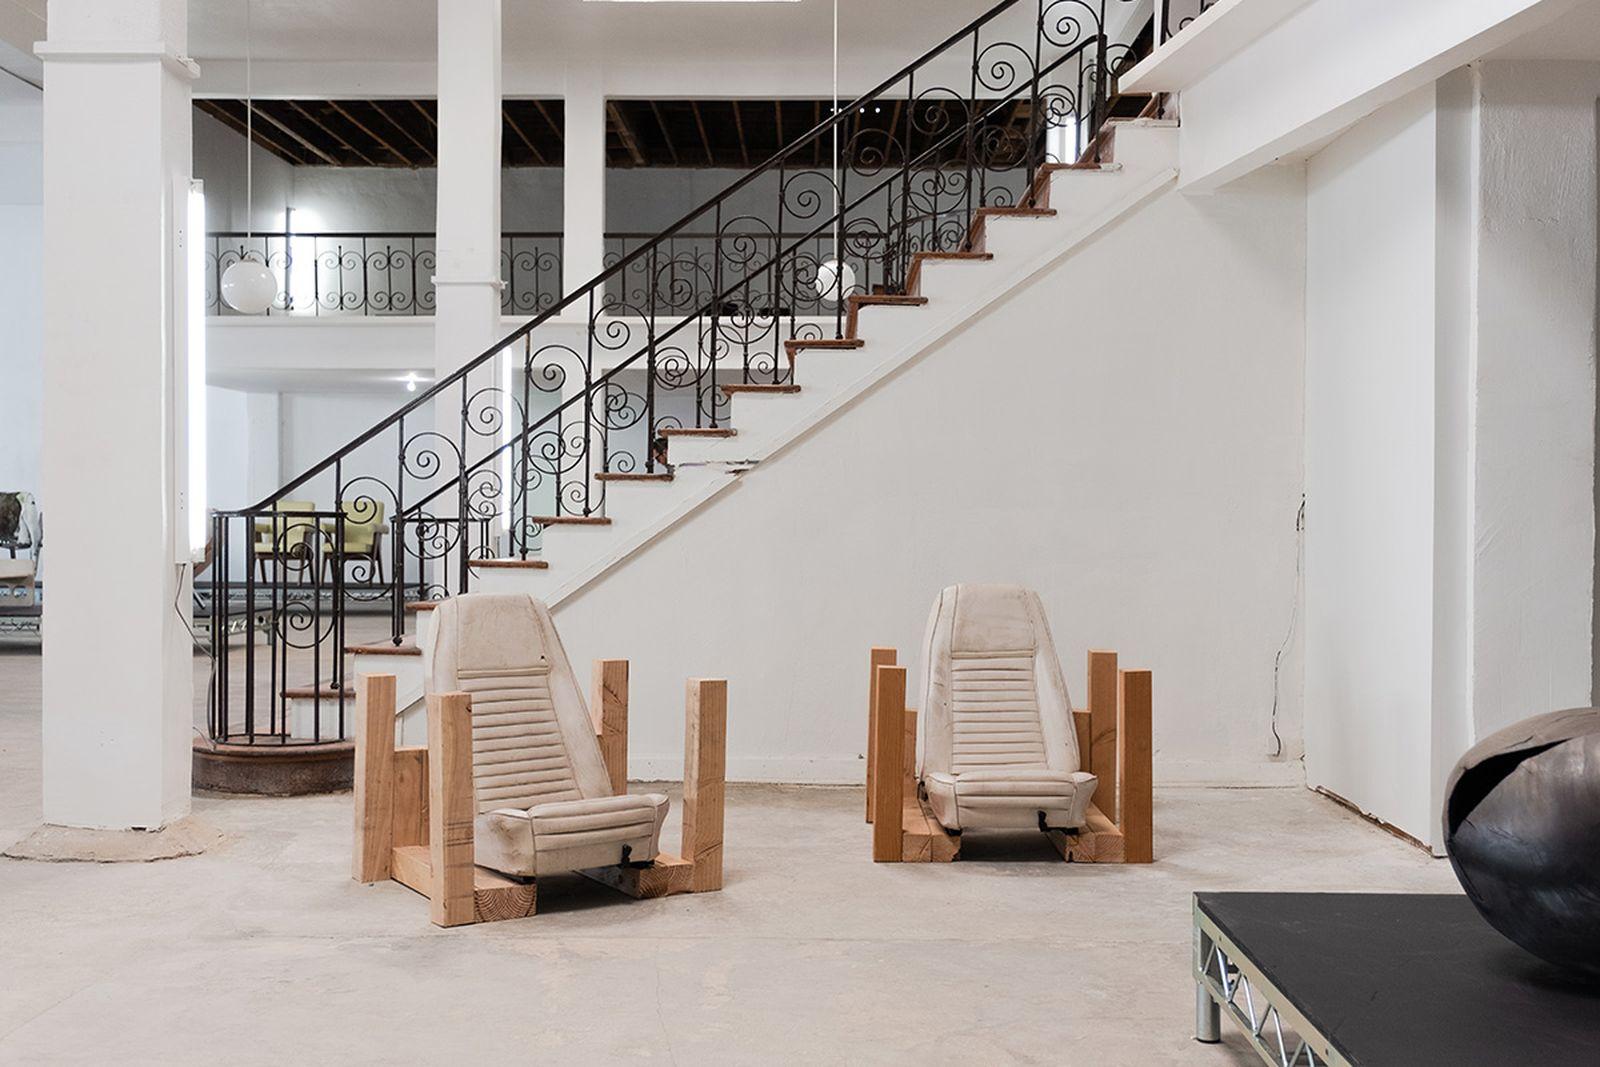 sized-los-angeles-exhibition-luka-sabbat-02